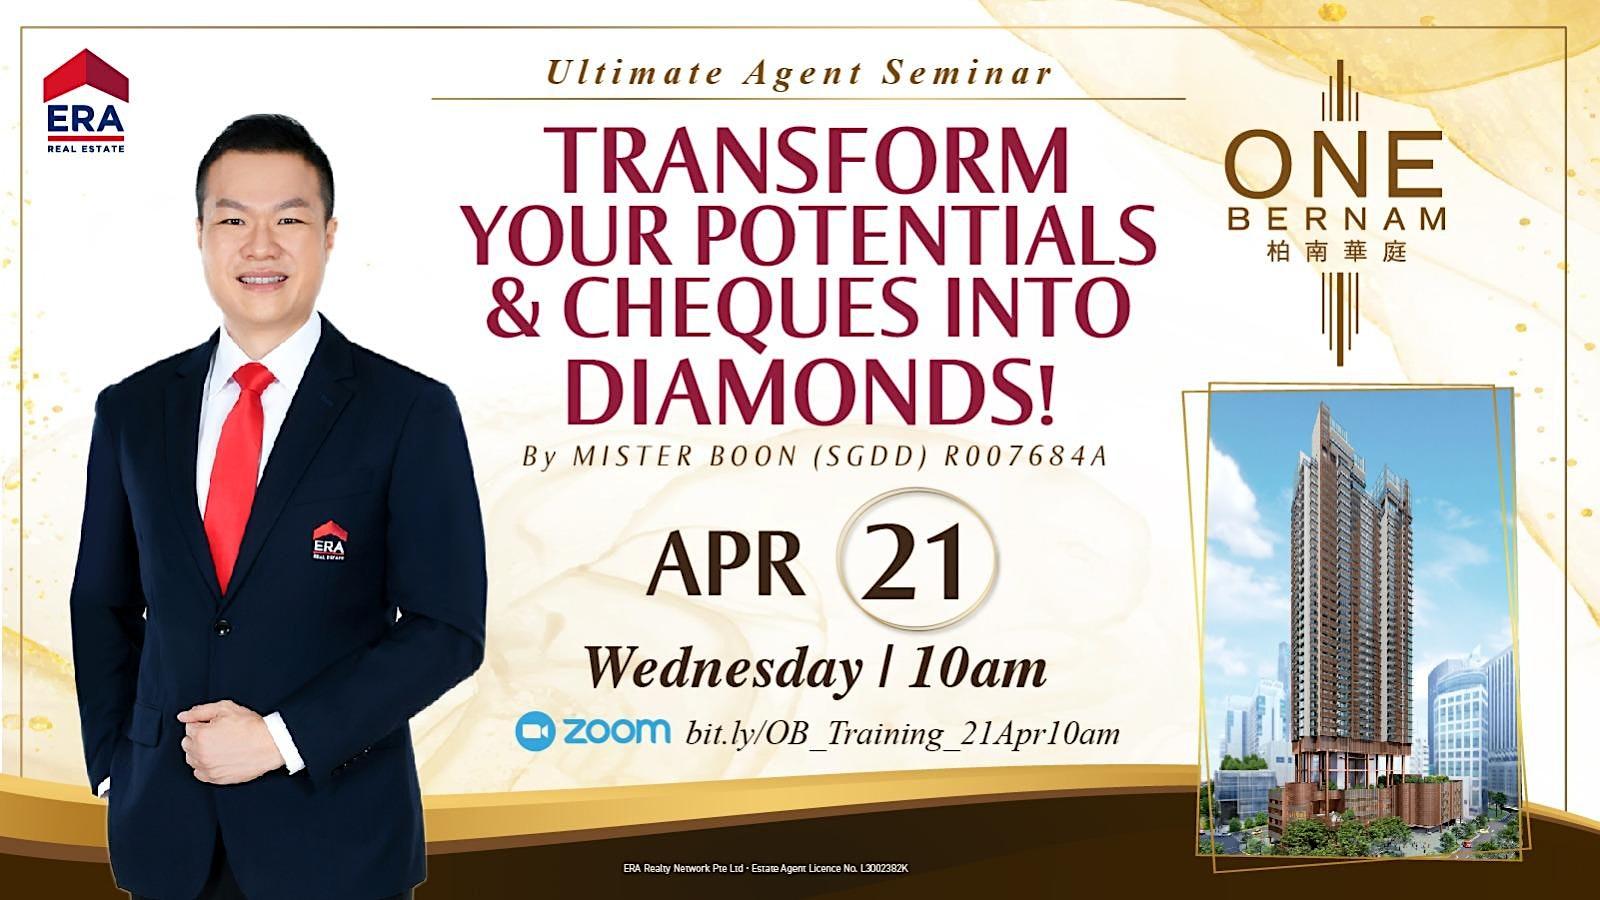 Transform Your Potentials & Cheques Into Diamonds! (One Bernam)